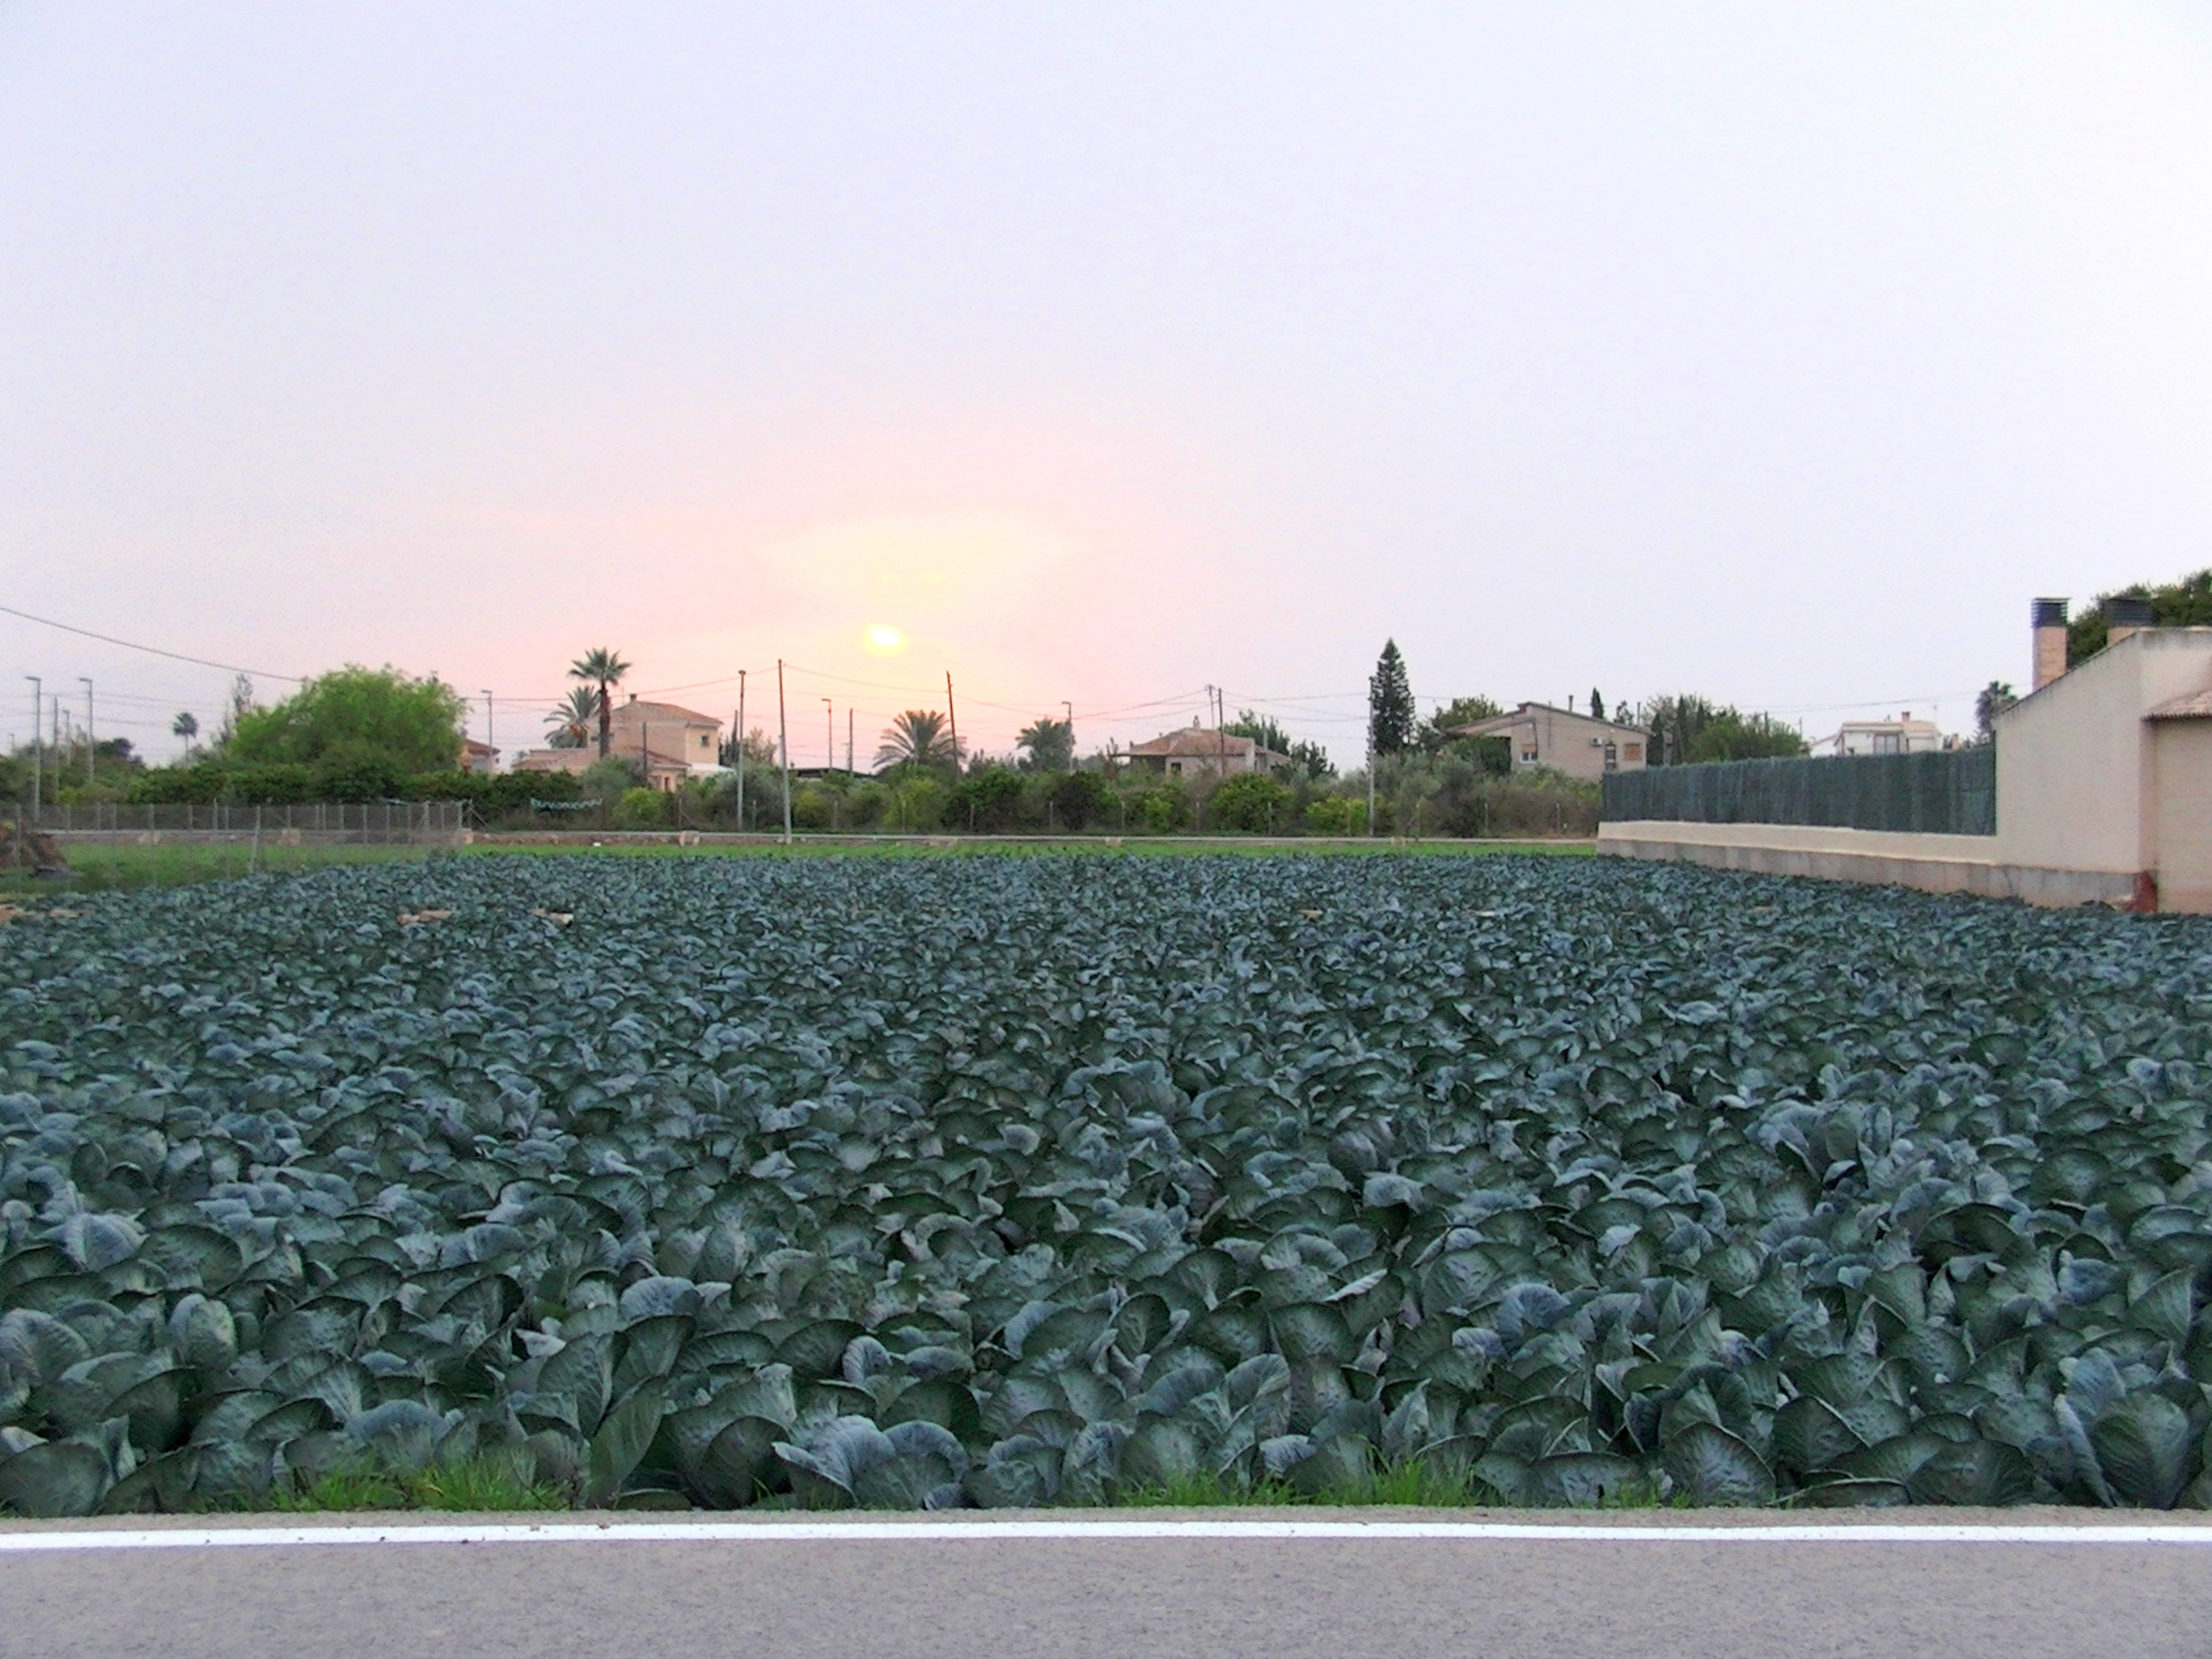 Imagen de la huerta de Murcia. ecv.